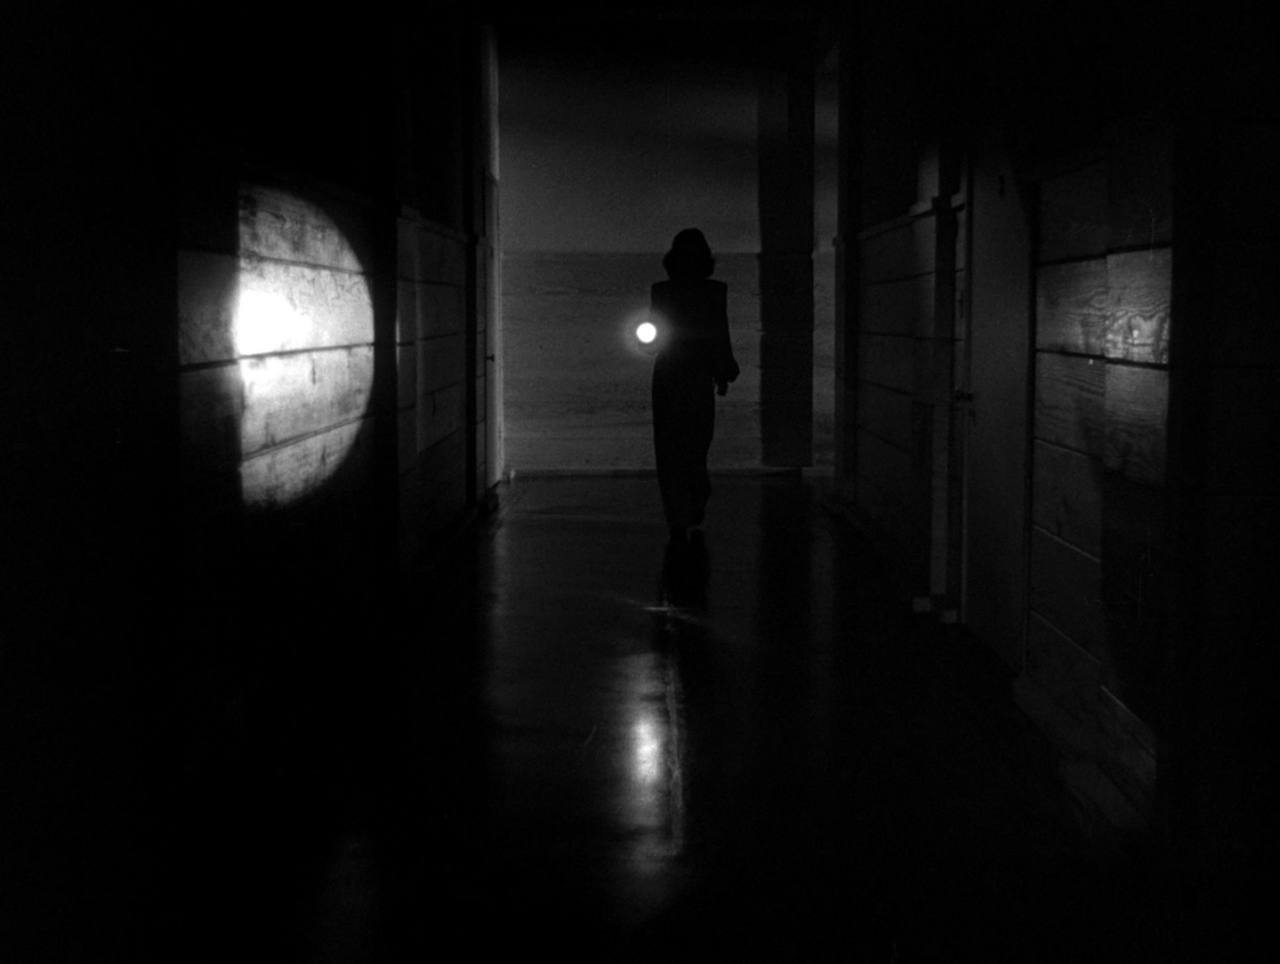 https://www.film-rezensionen.de/wp-content/uploads/2011/06/Geheimnis-hinter-der-T%c3%bcr-Frontpage.jpg